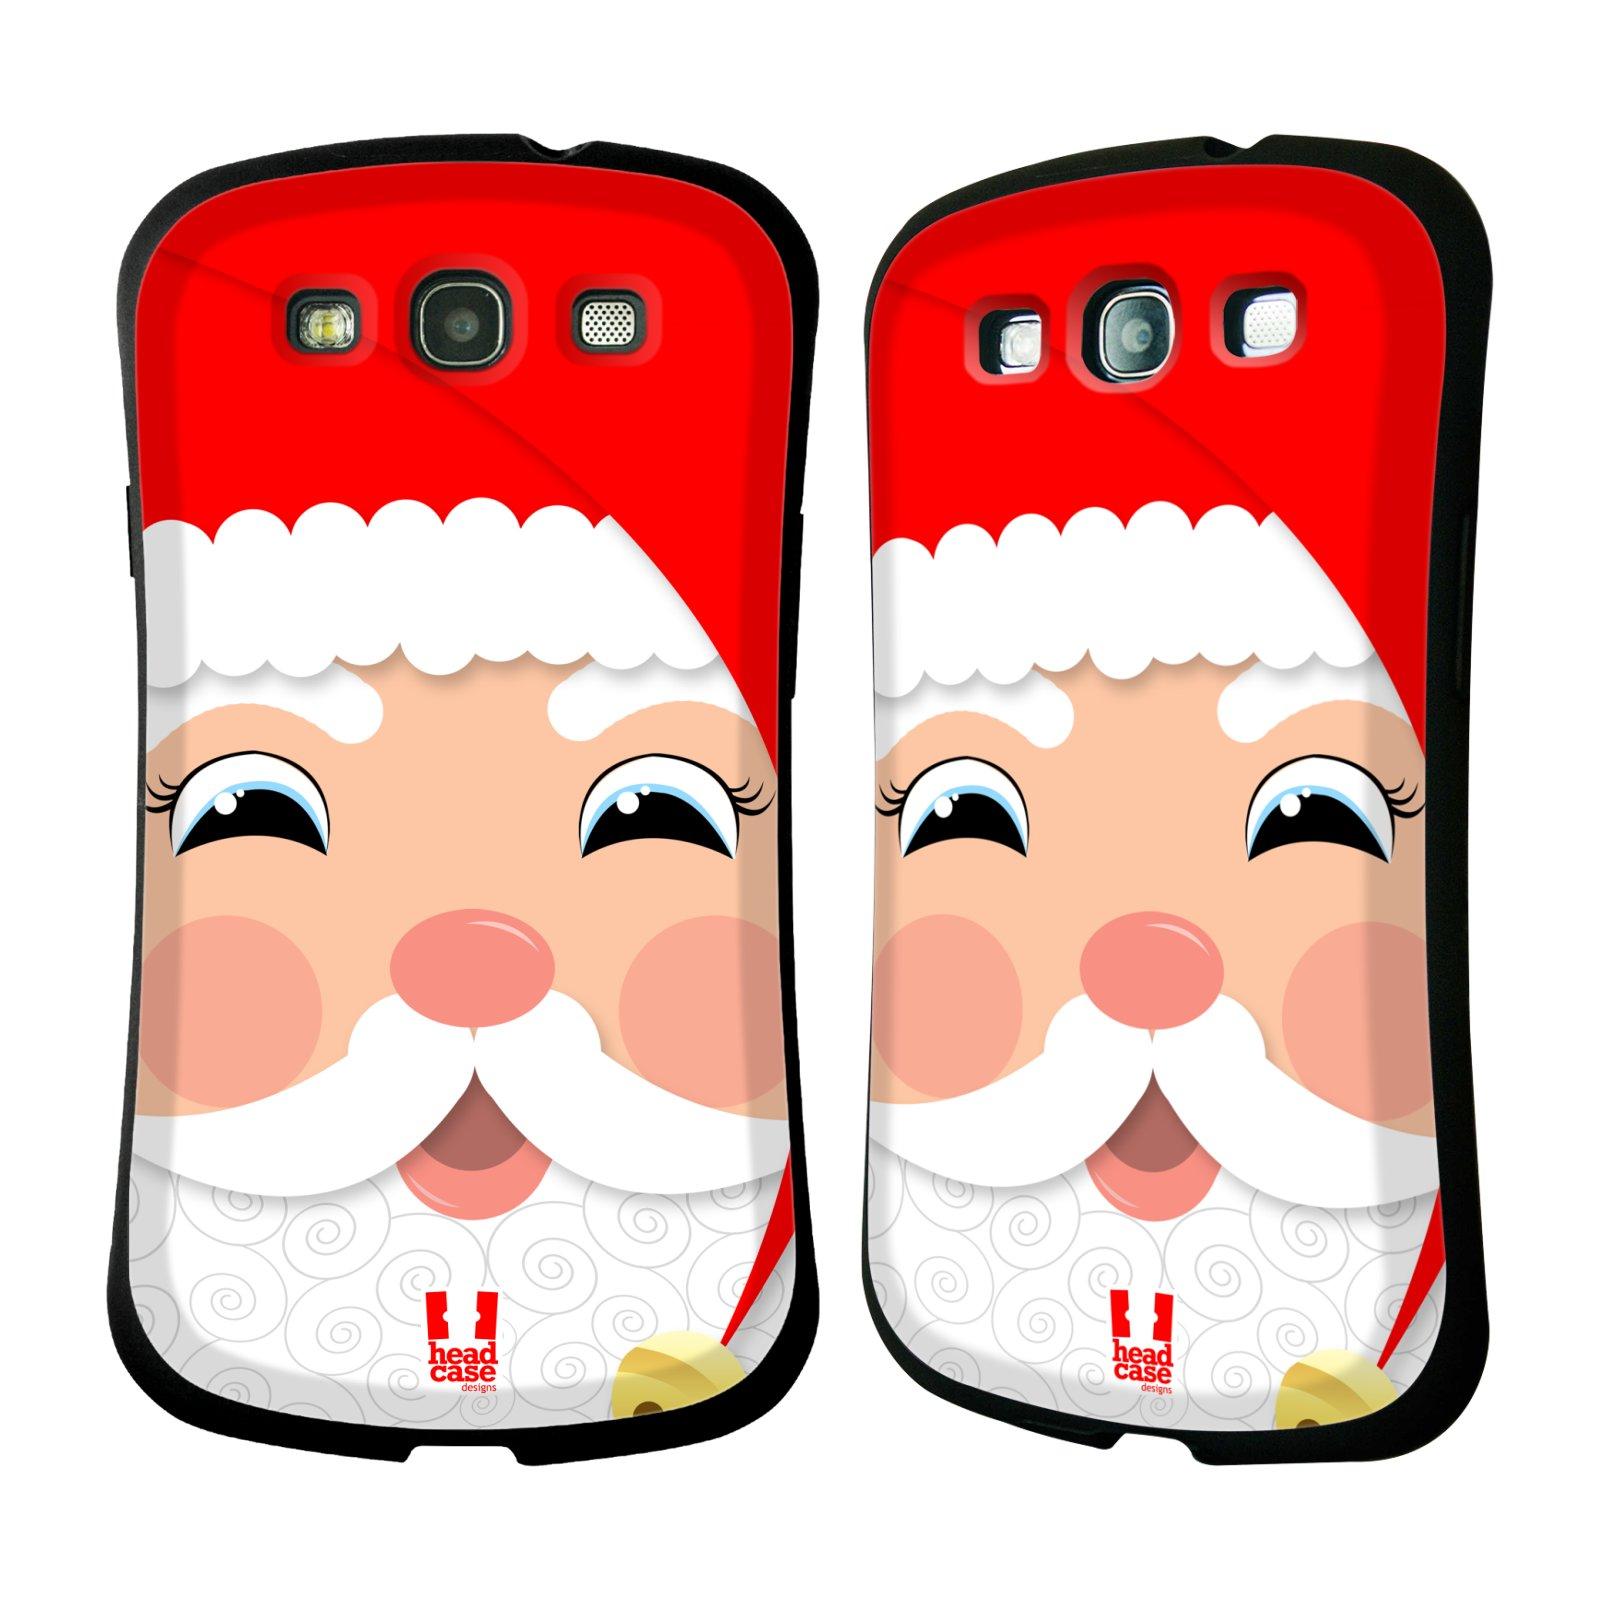 HEAD CASE silikon/plast odolný obal na mobil Samsung Galaxy S3 vzor Vánoční tváře kreslené SANTA CLAUS